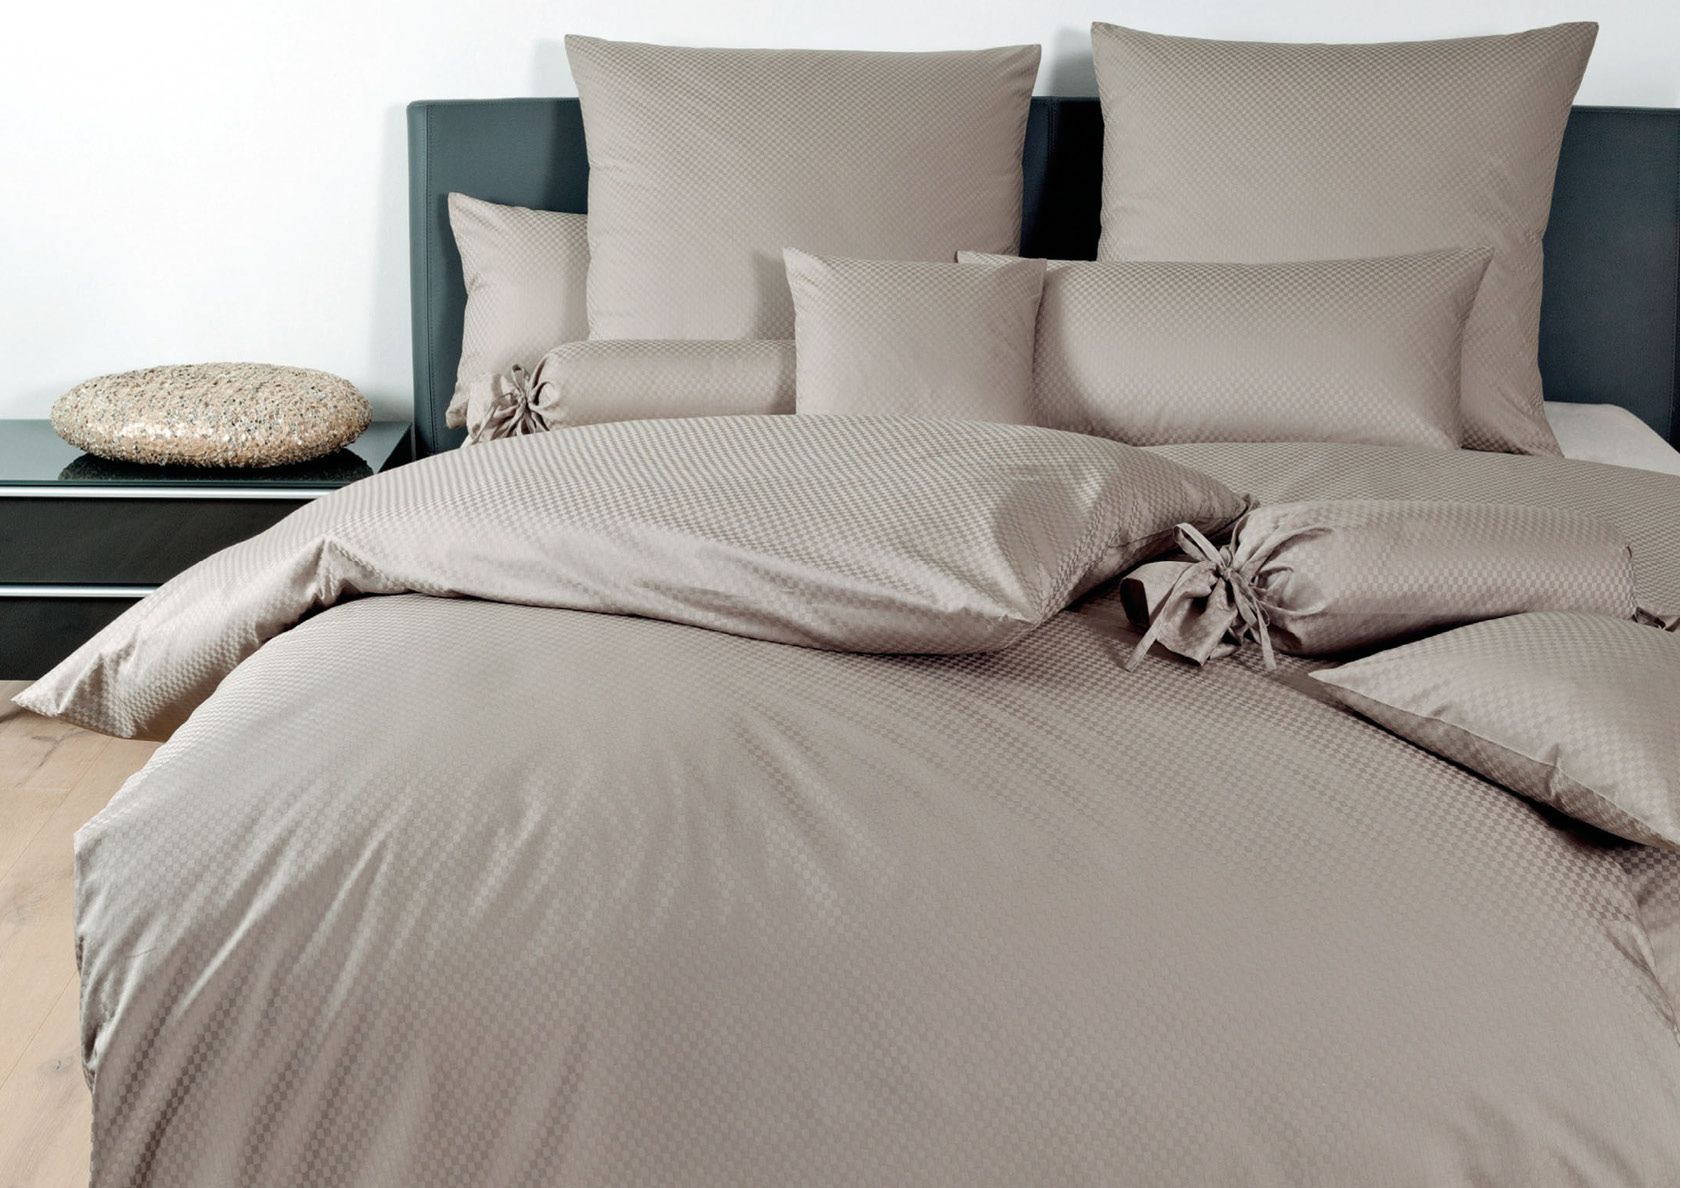 rubin 1323 peter kling gmbh das bettenhaus m bel kling in pirmasens. Black Bedroom Furniture Sets. Home Design Ideas